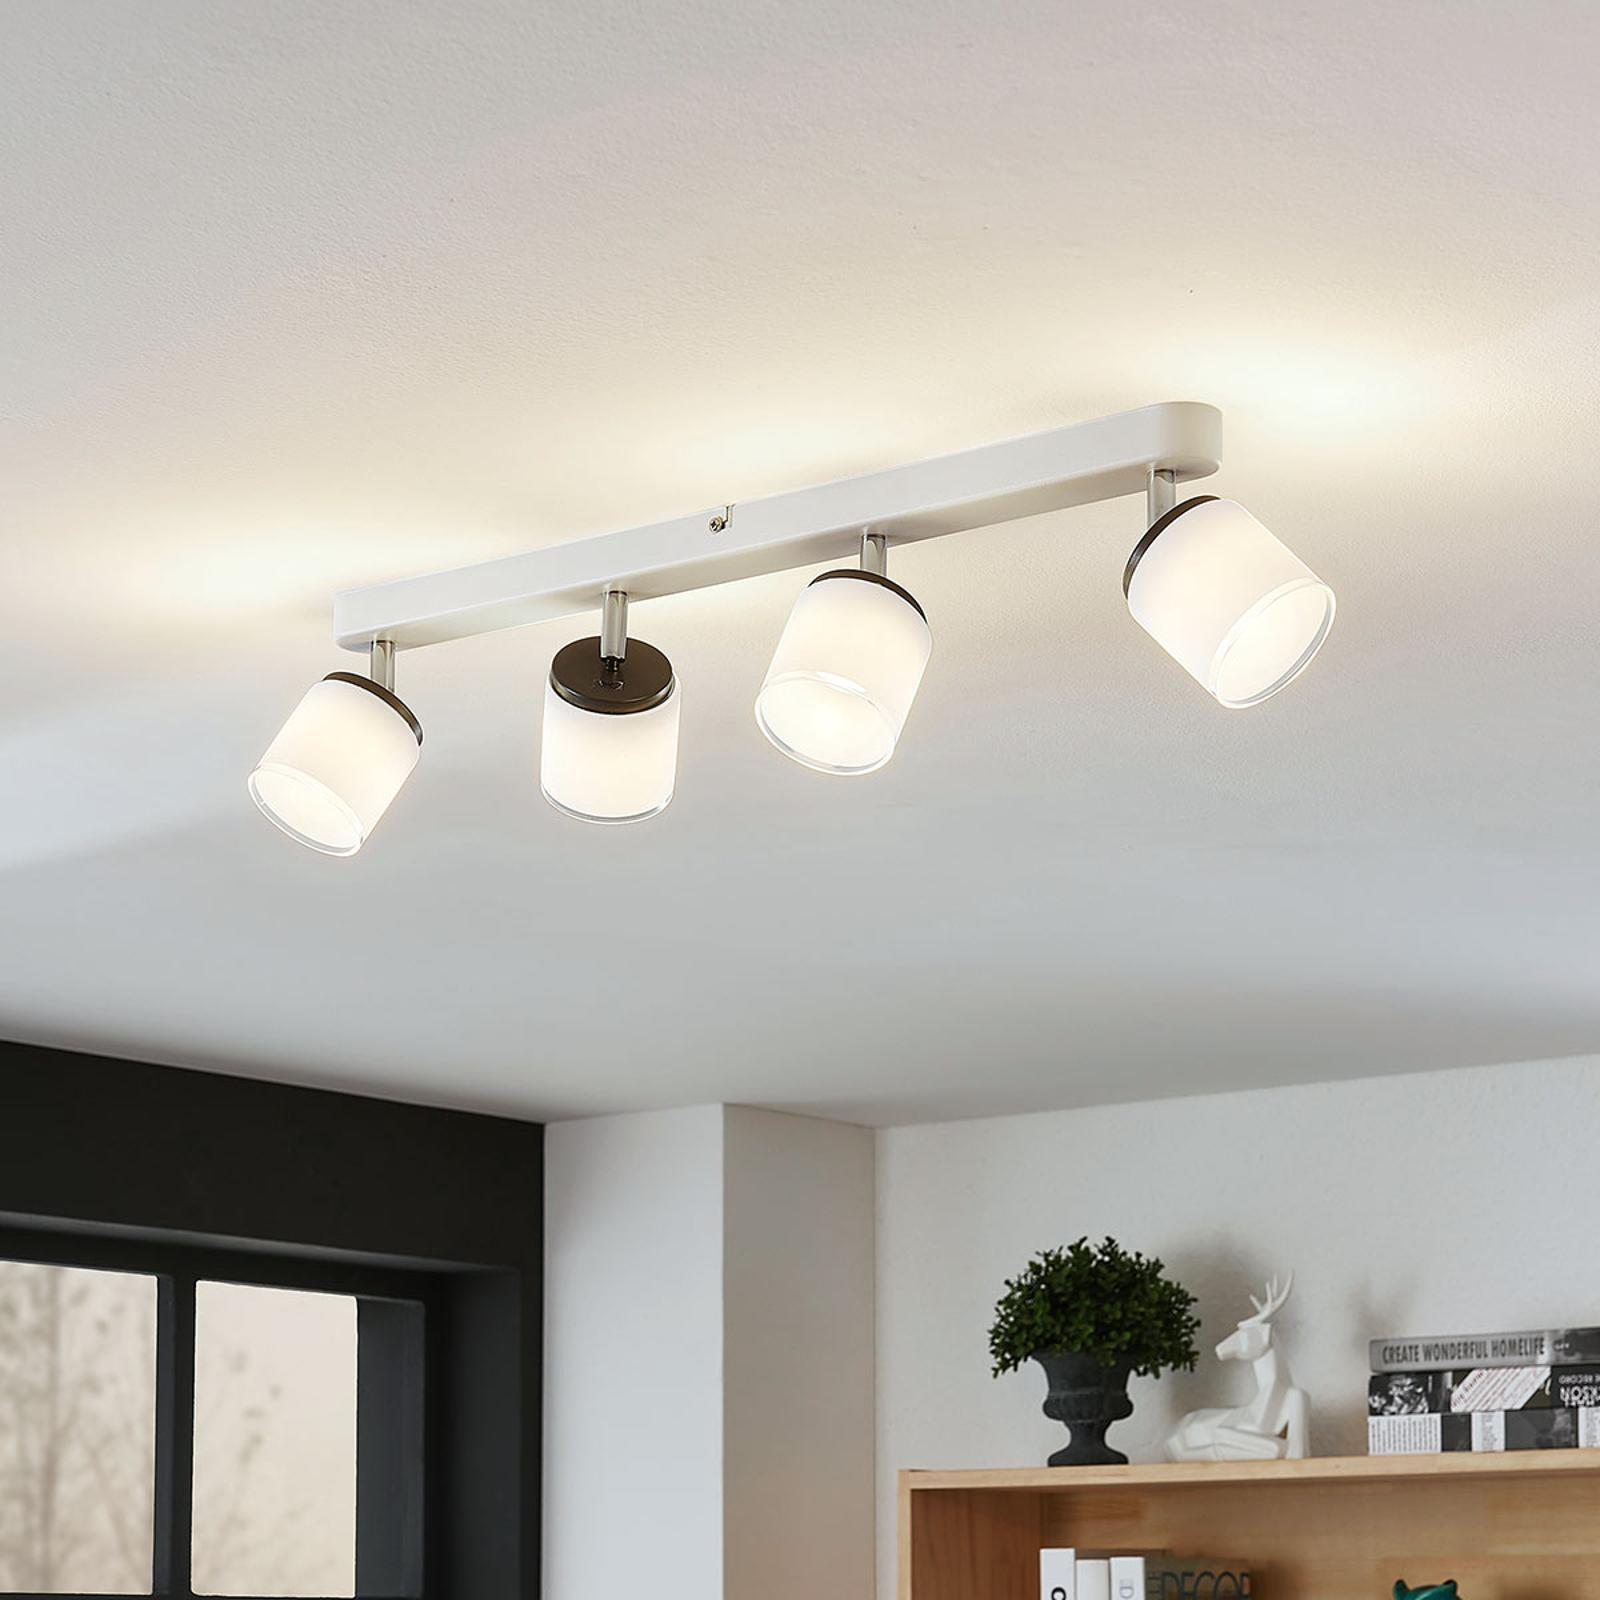 LED-Deckenspot Futura, 4-flammig